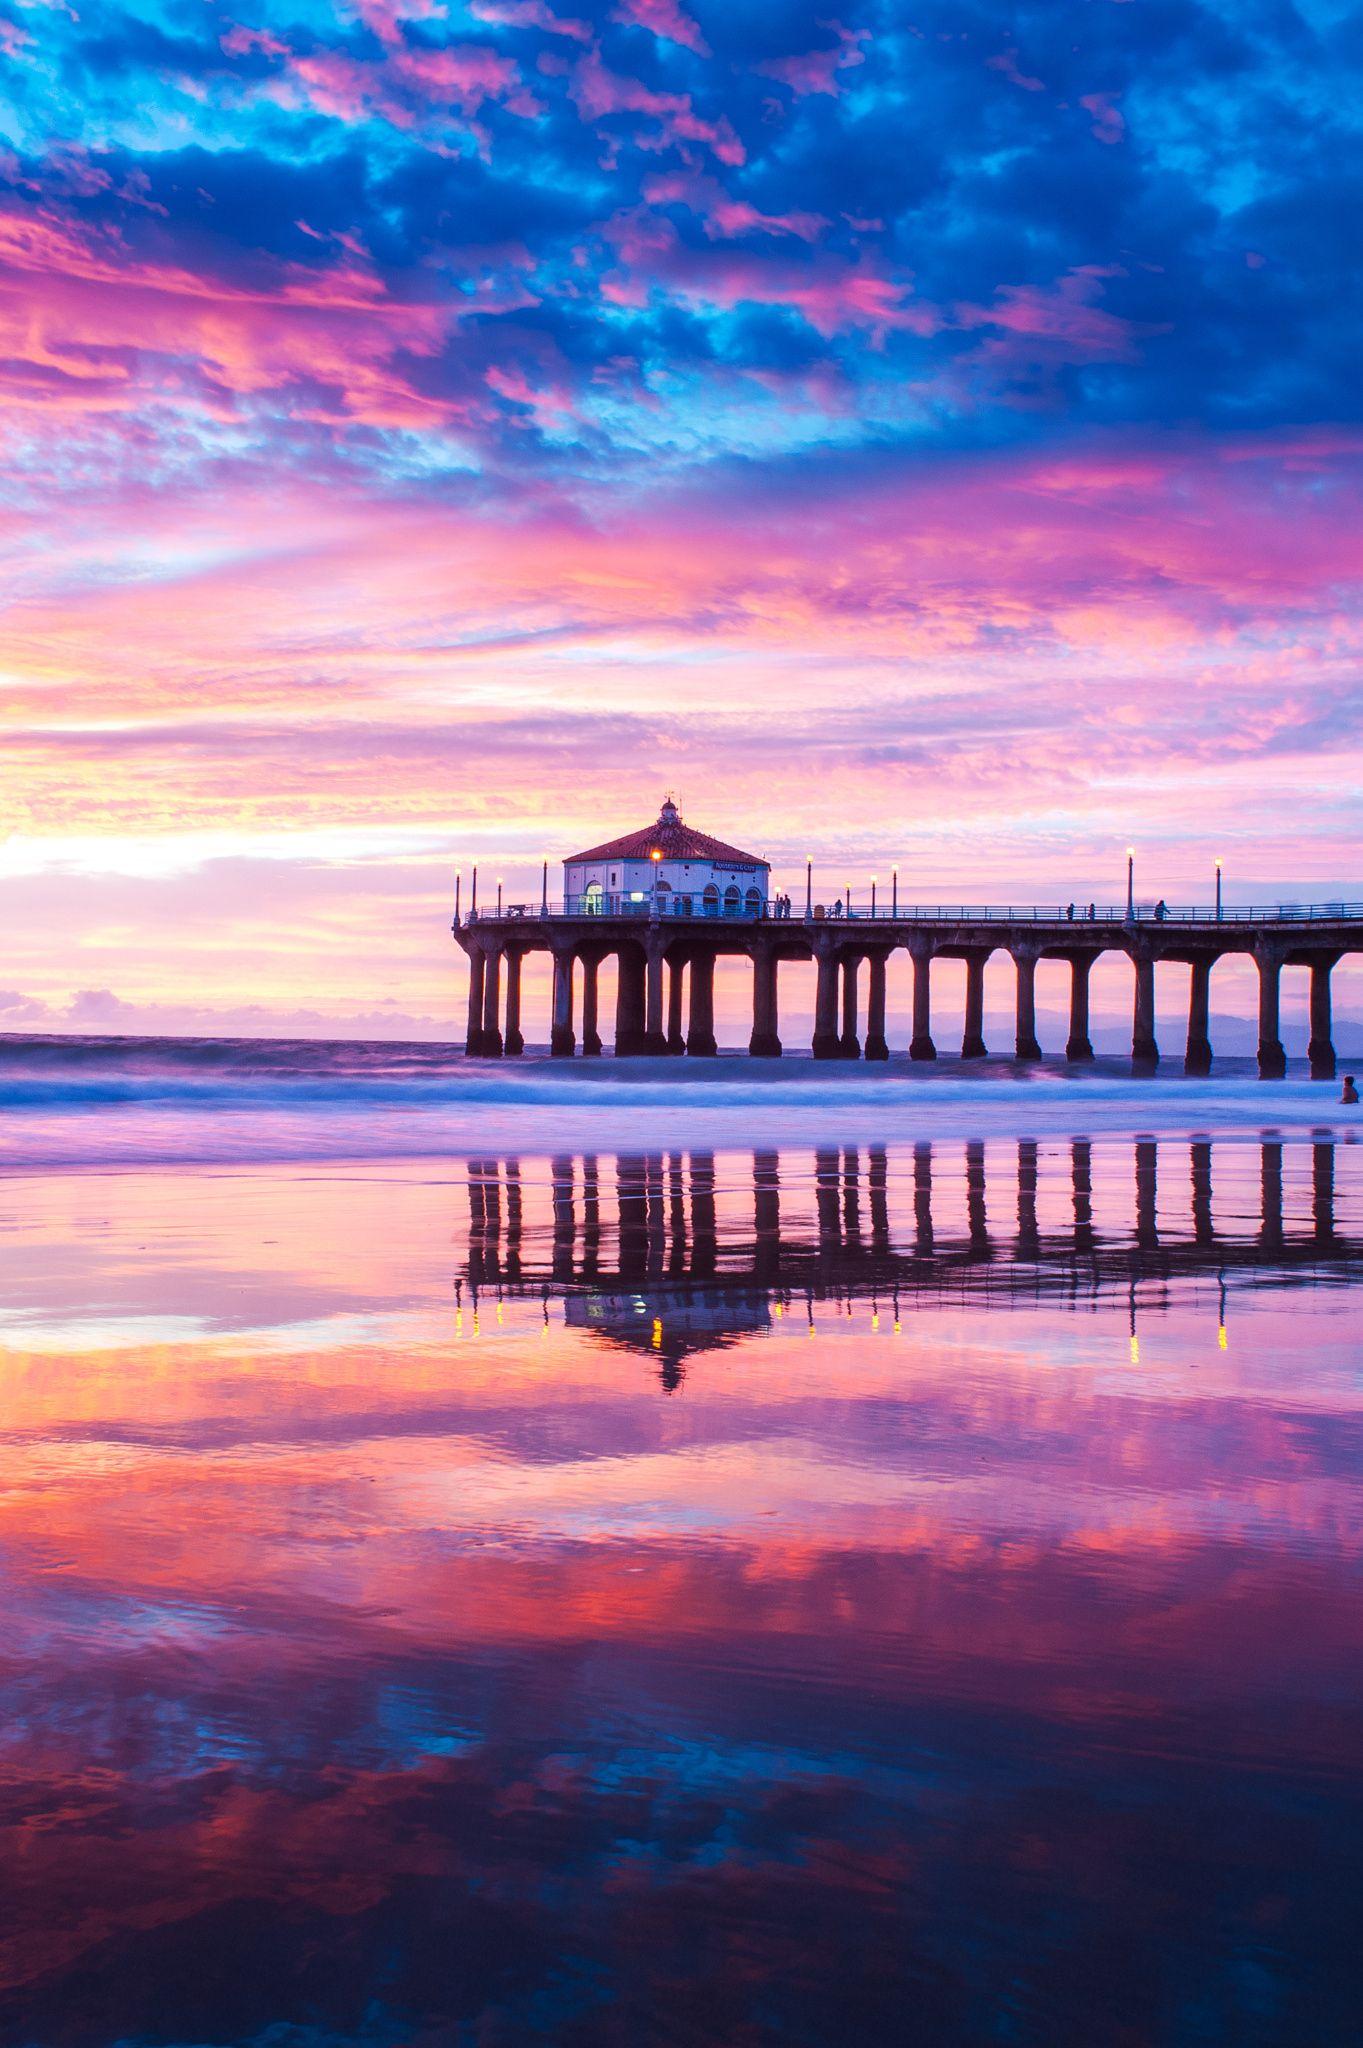 Manhattan Beach Pier Reflections No. 1 By Thomas Sebourn